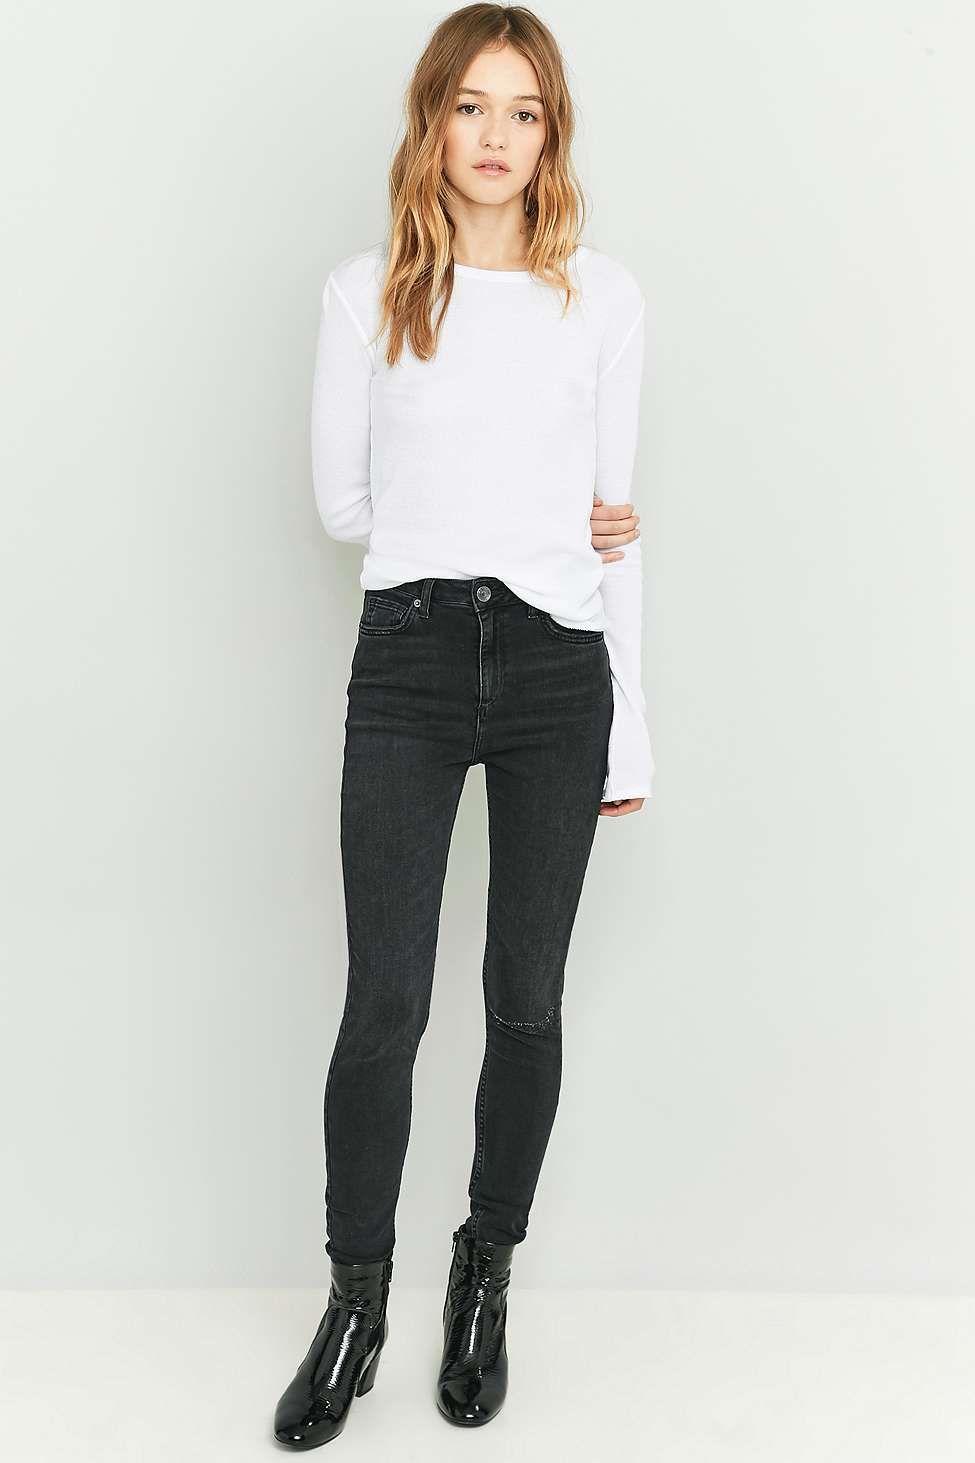 84b65adf7c7 BDG Pine High-Rise Worn Black Super Skinny Jeans